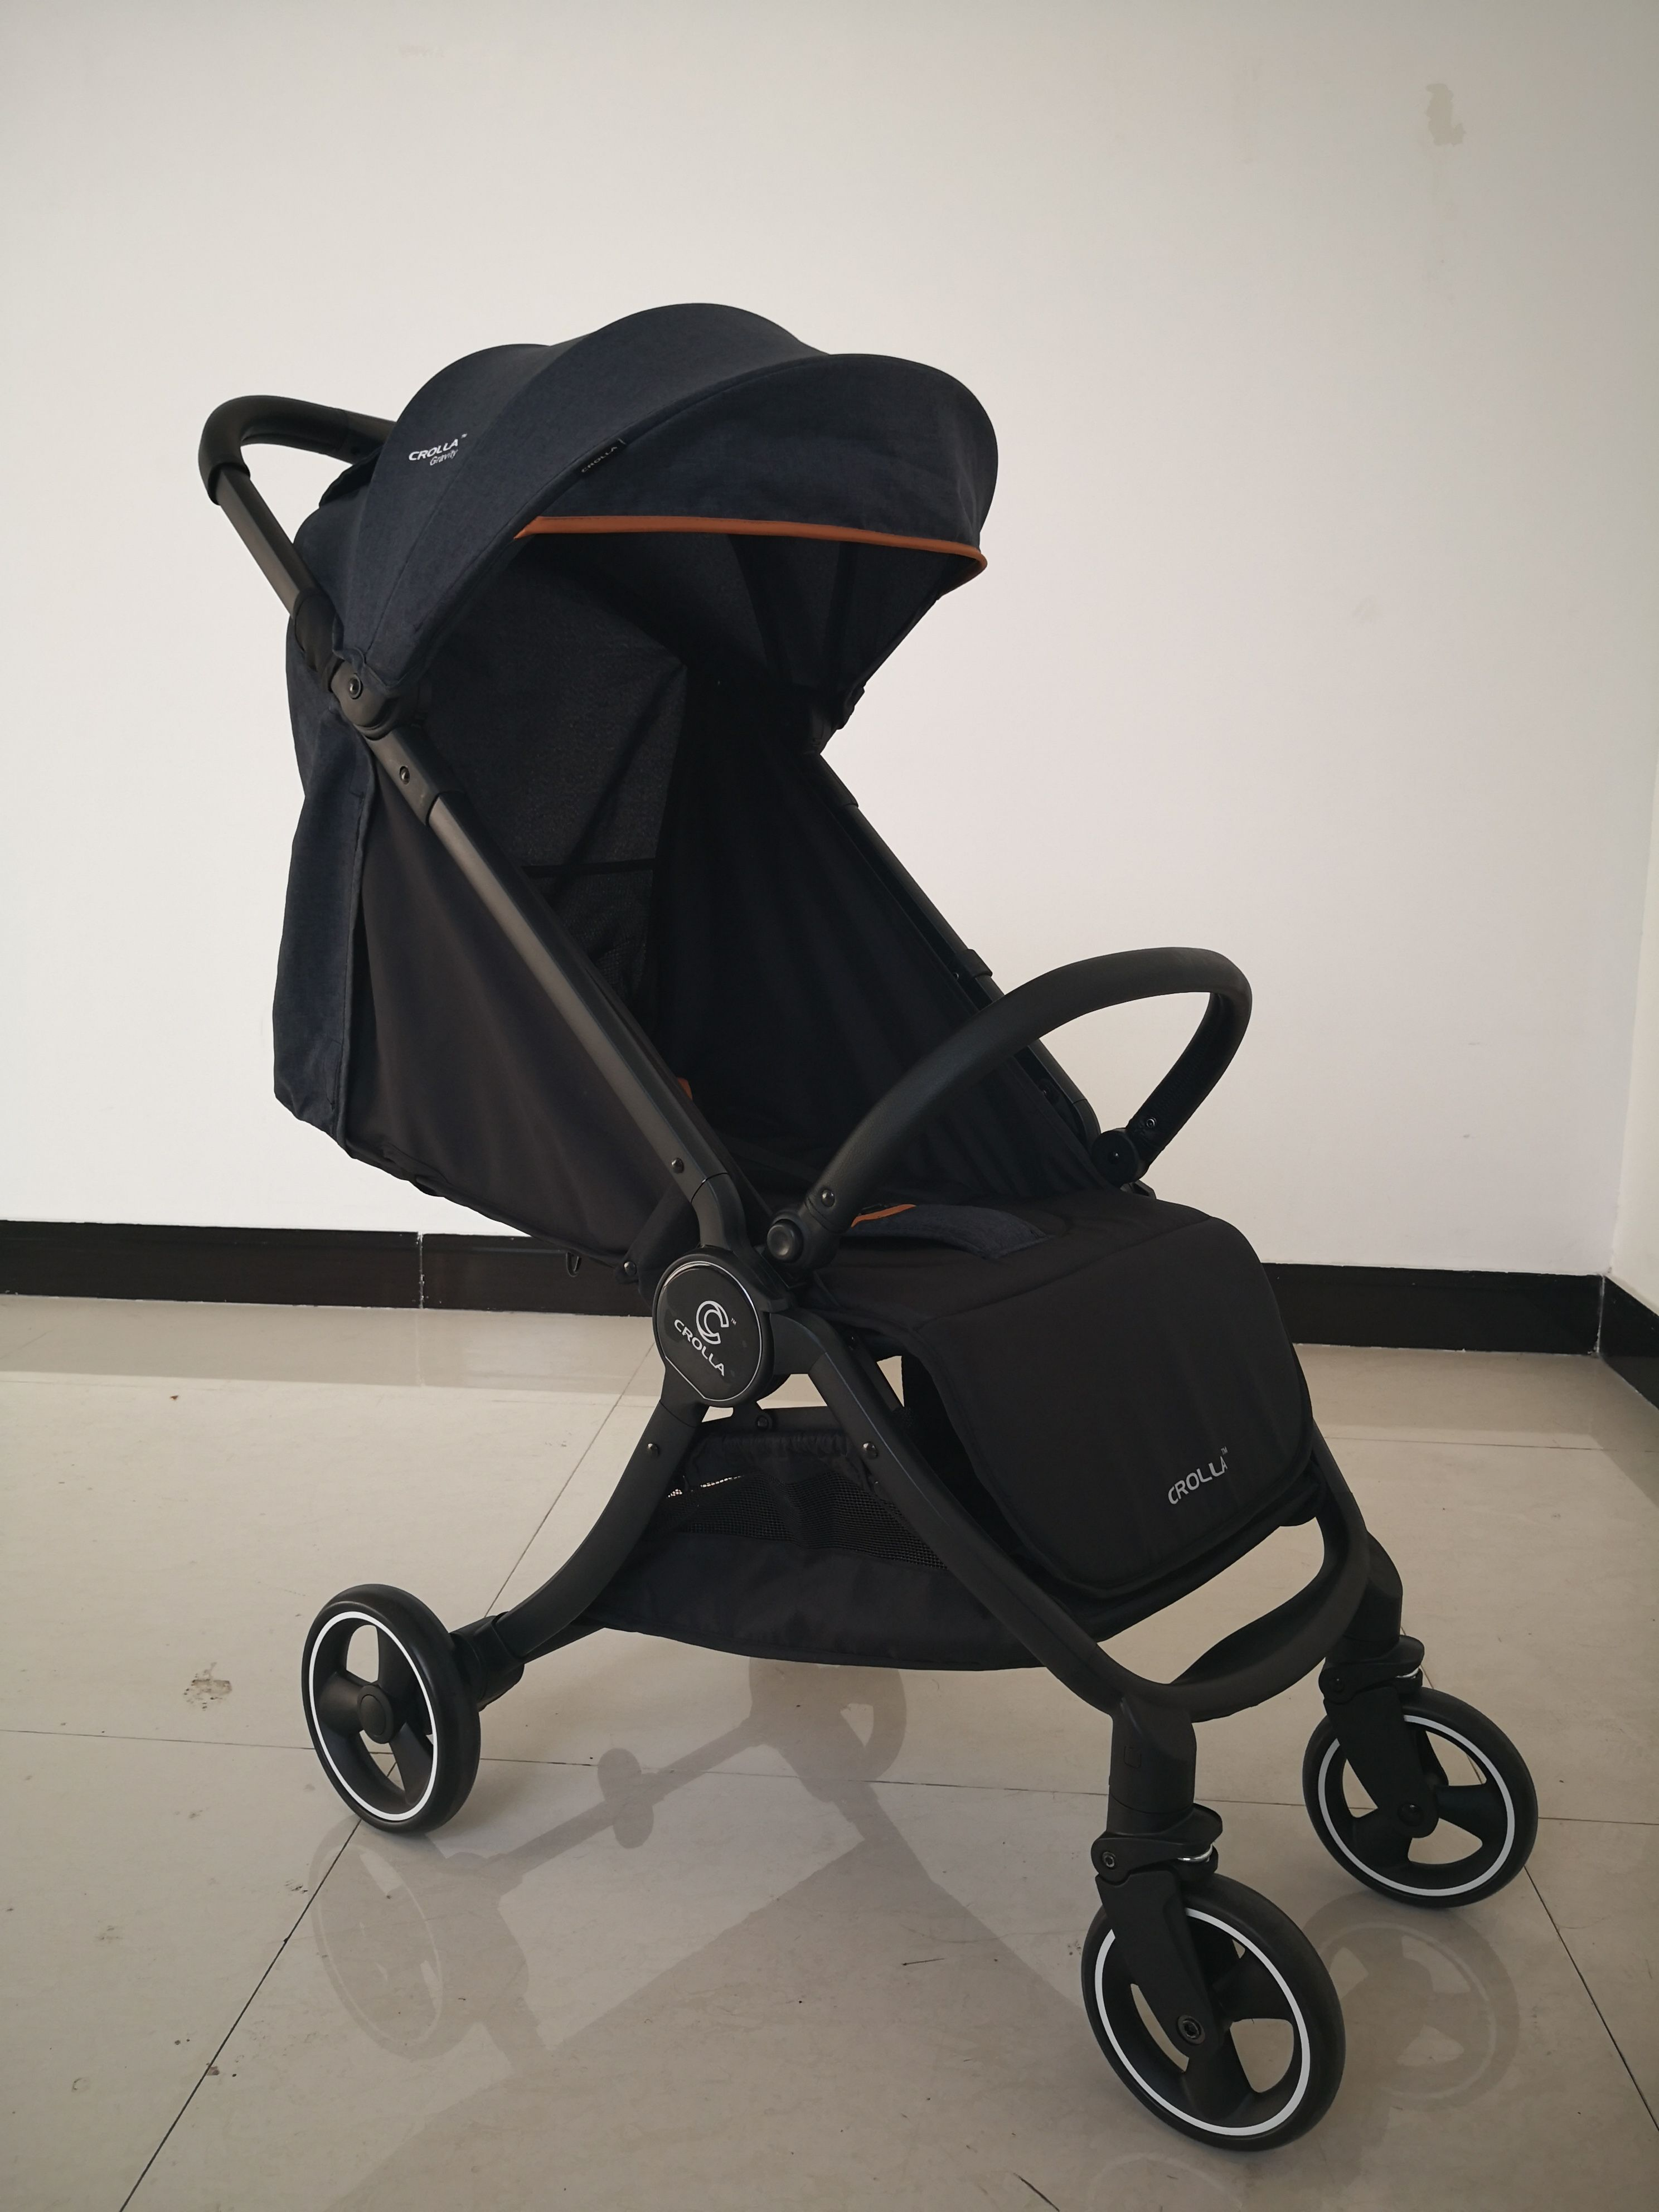 Domestic popular light portable baby stroller, lightweight